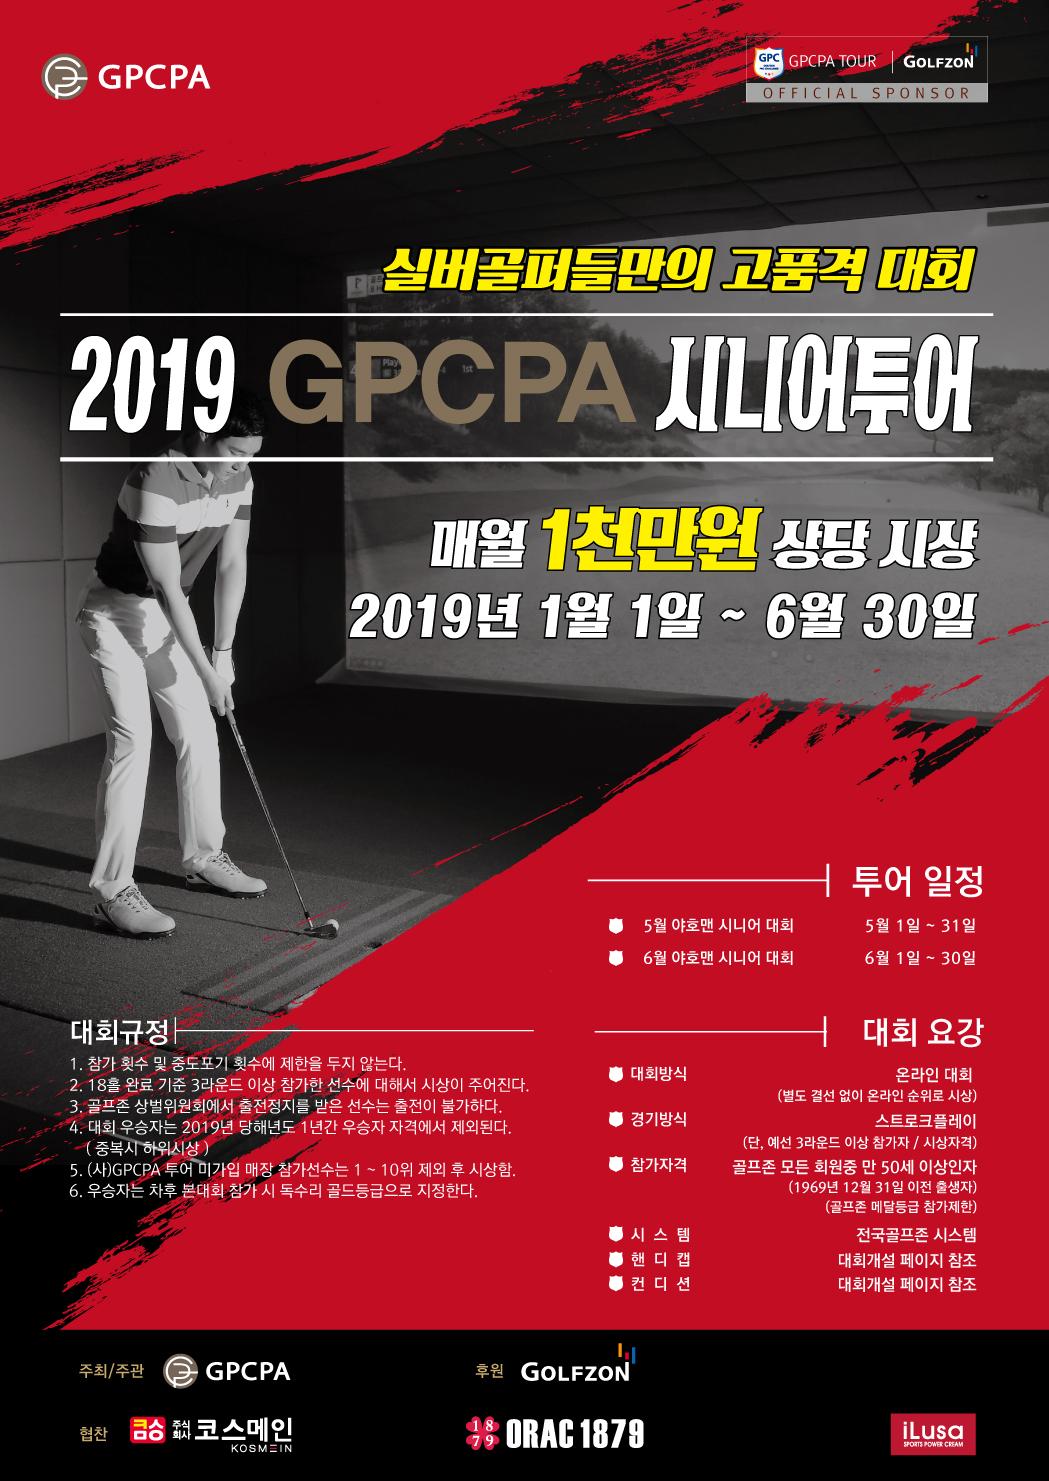 2019 GPCPA 시니어 5차